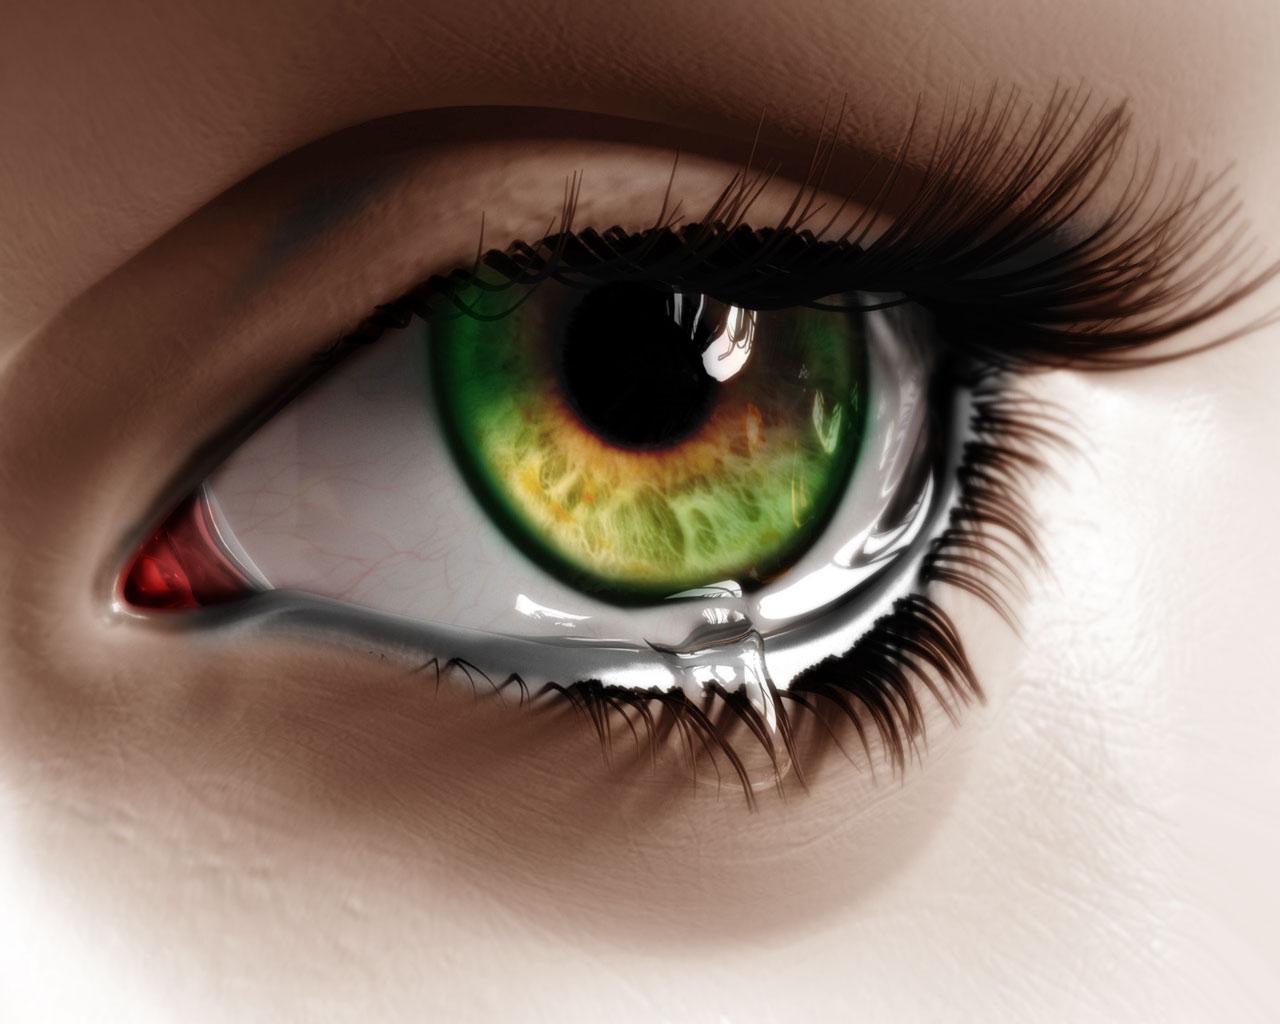 http://3.bp.blogspot.com/-iVrkMXkRxRs/Tlfeqwv61VI/AAAAAAAAAsc/rTAJ1sXEBXg/s1600/sad-eyes-wallpaper.jpg